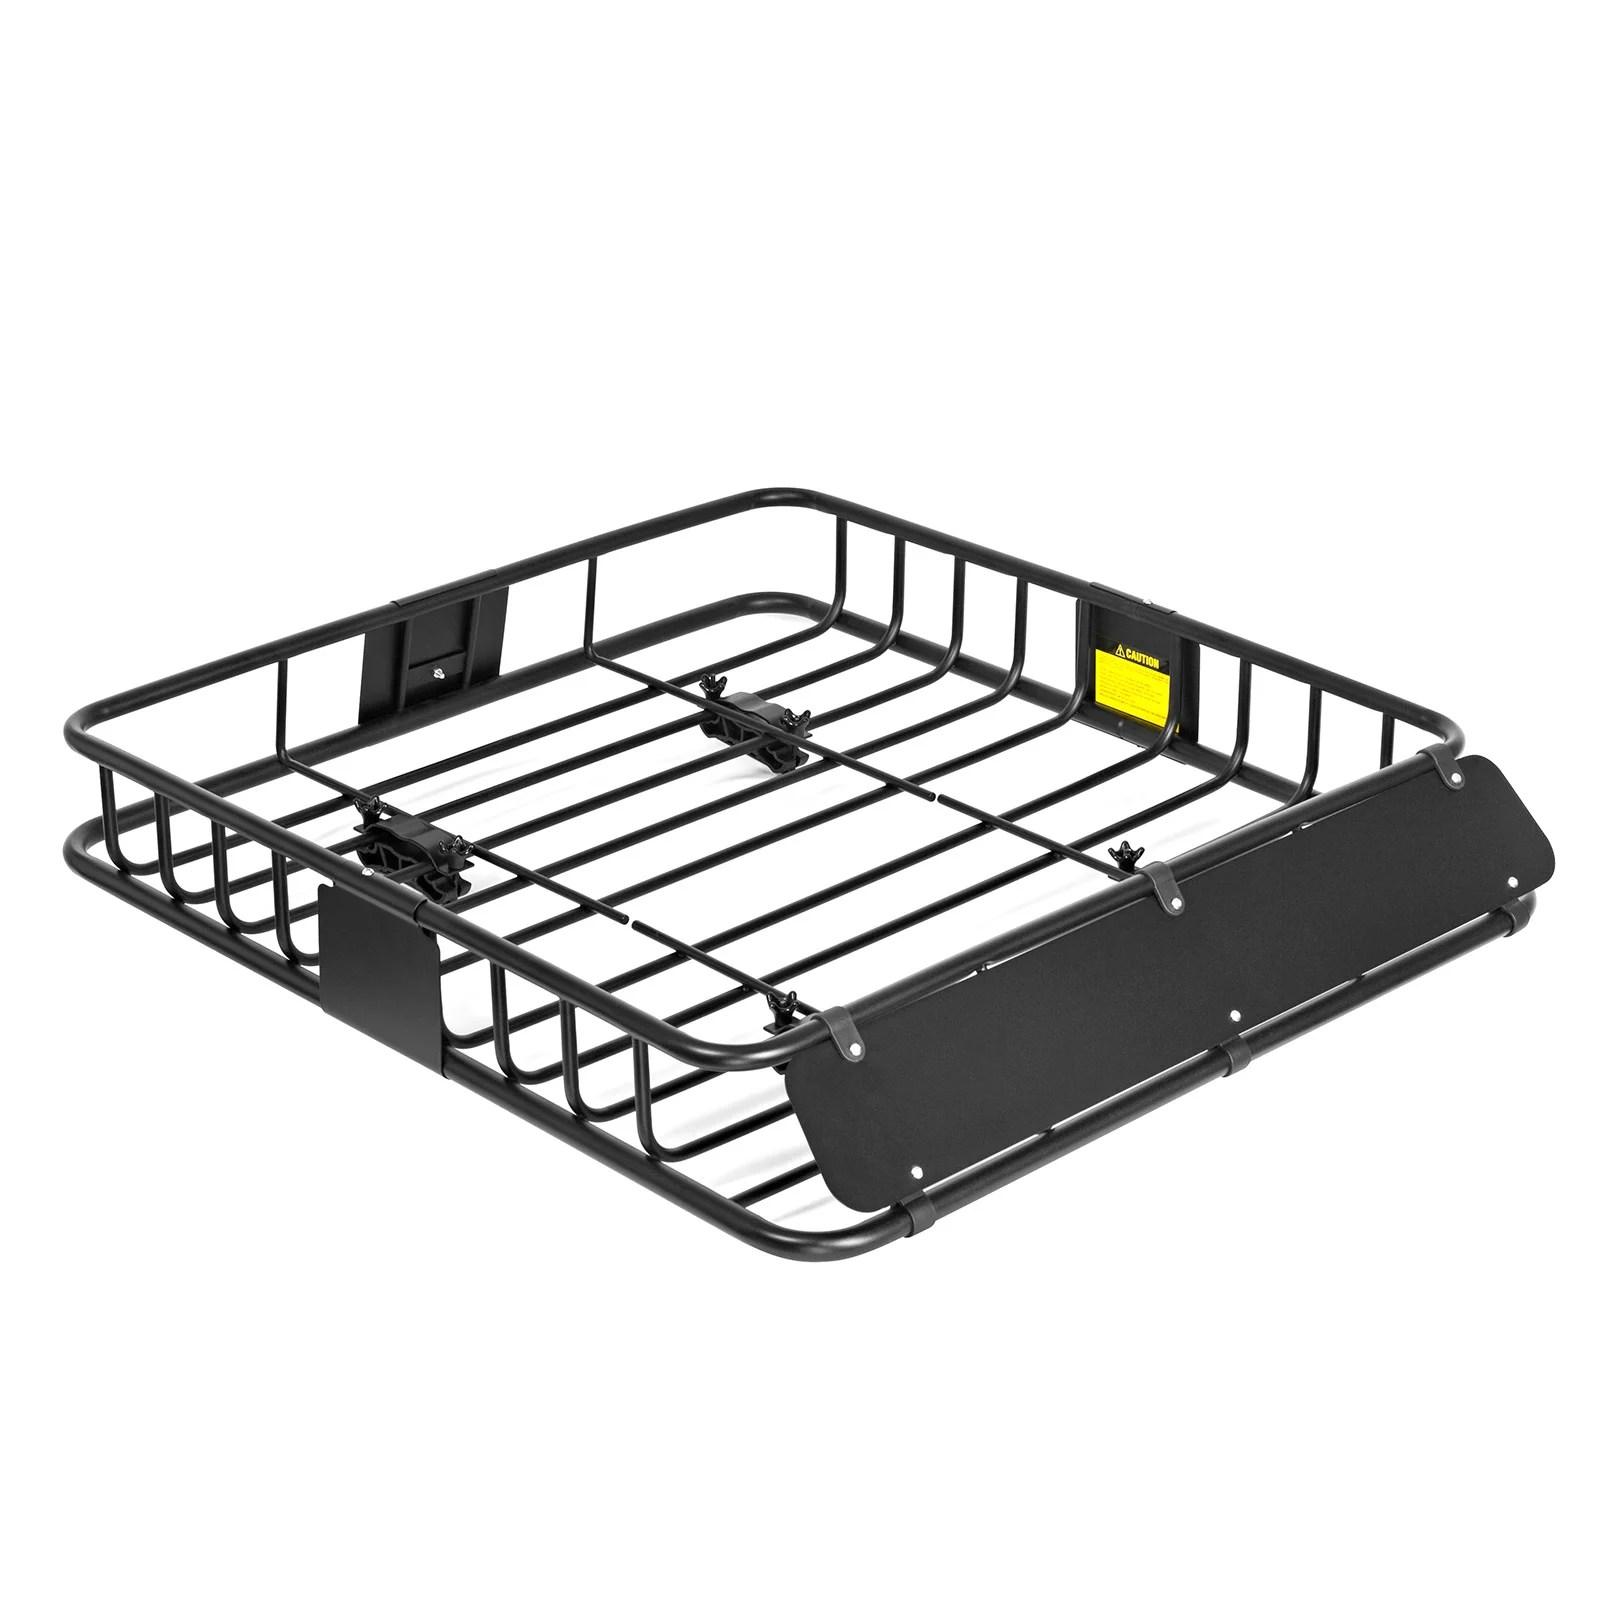 direct aftermarket powder coated steel cargo roof rack top luggage holder carrier basket travel 44 x 39 x 6 high side